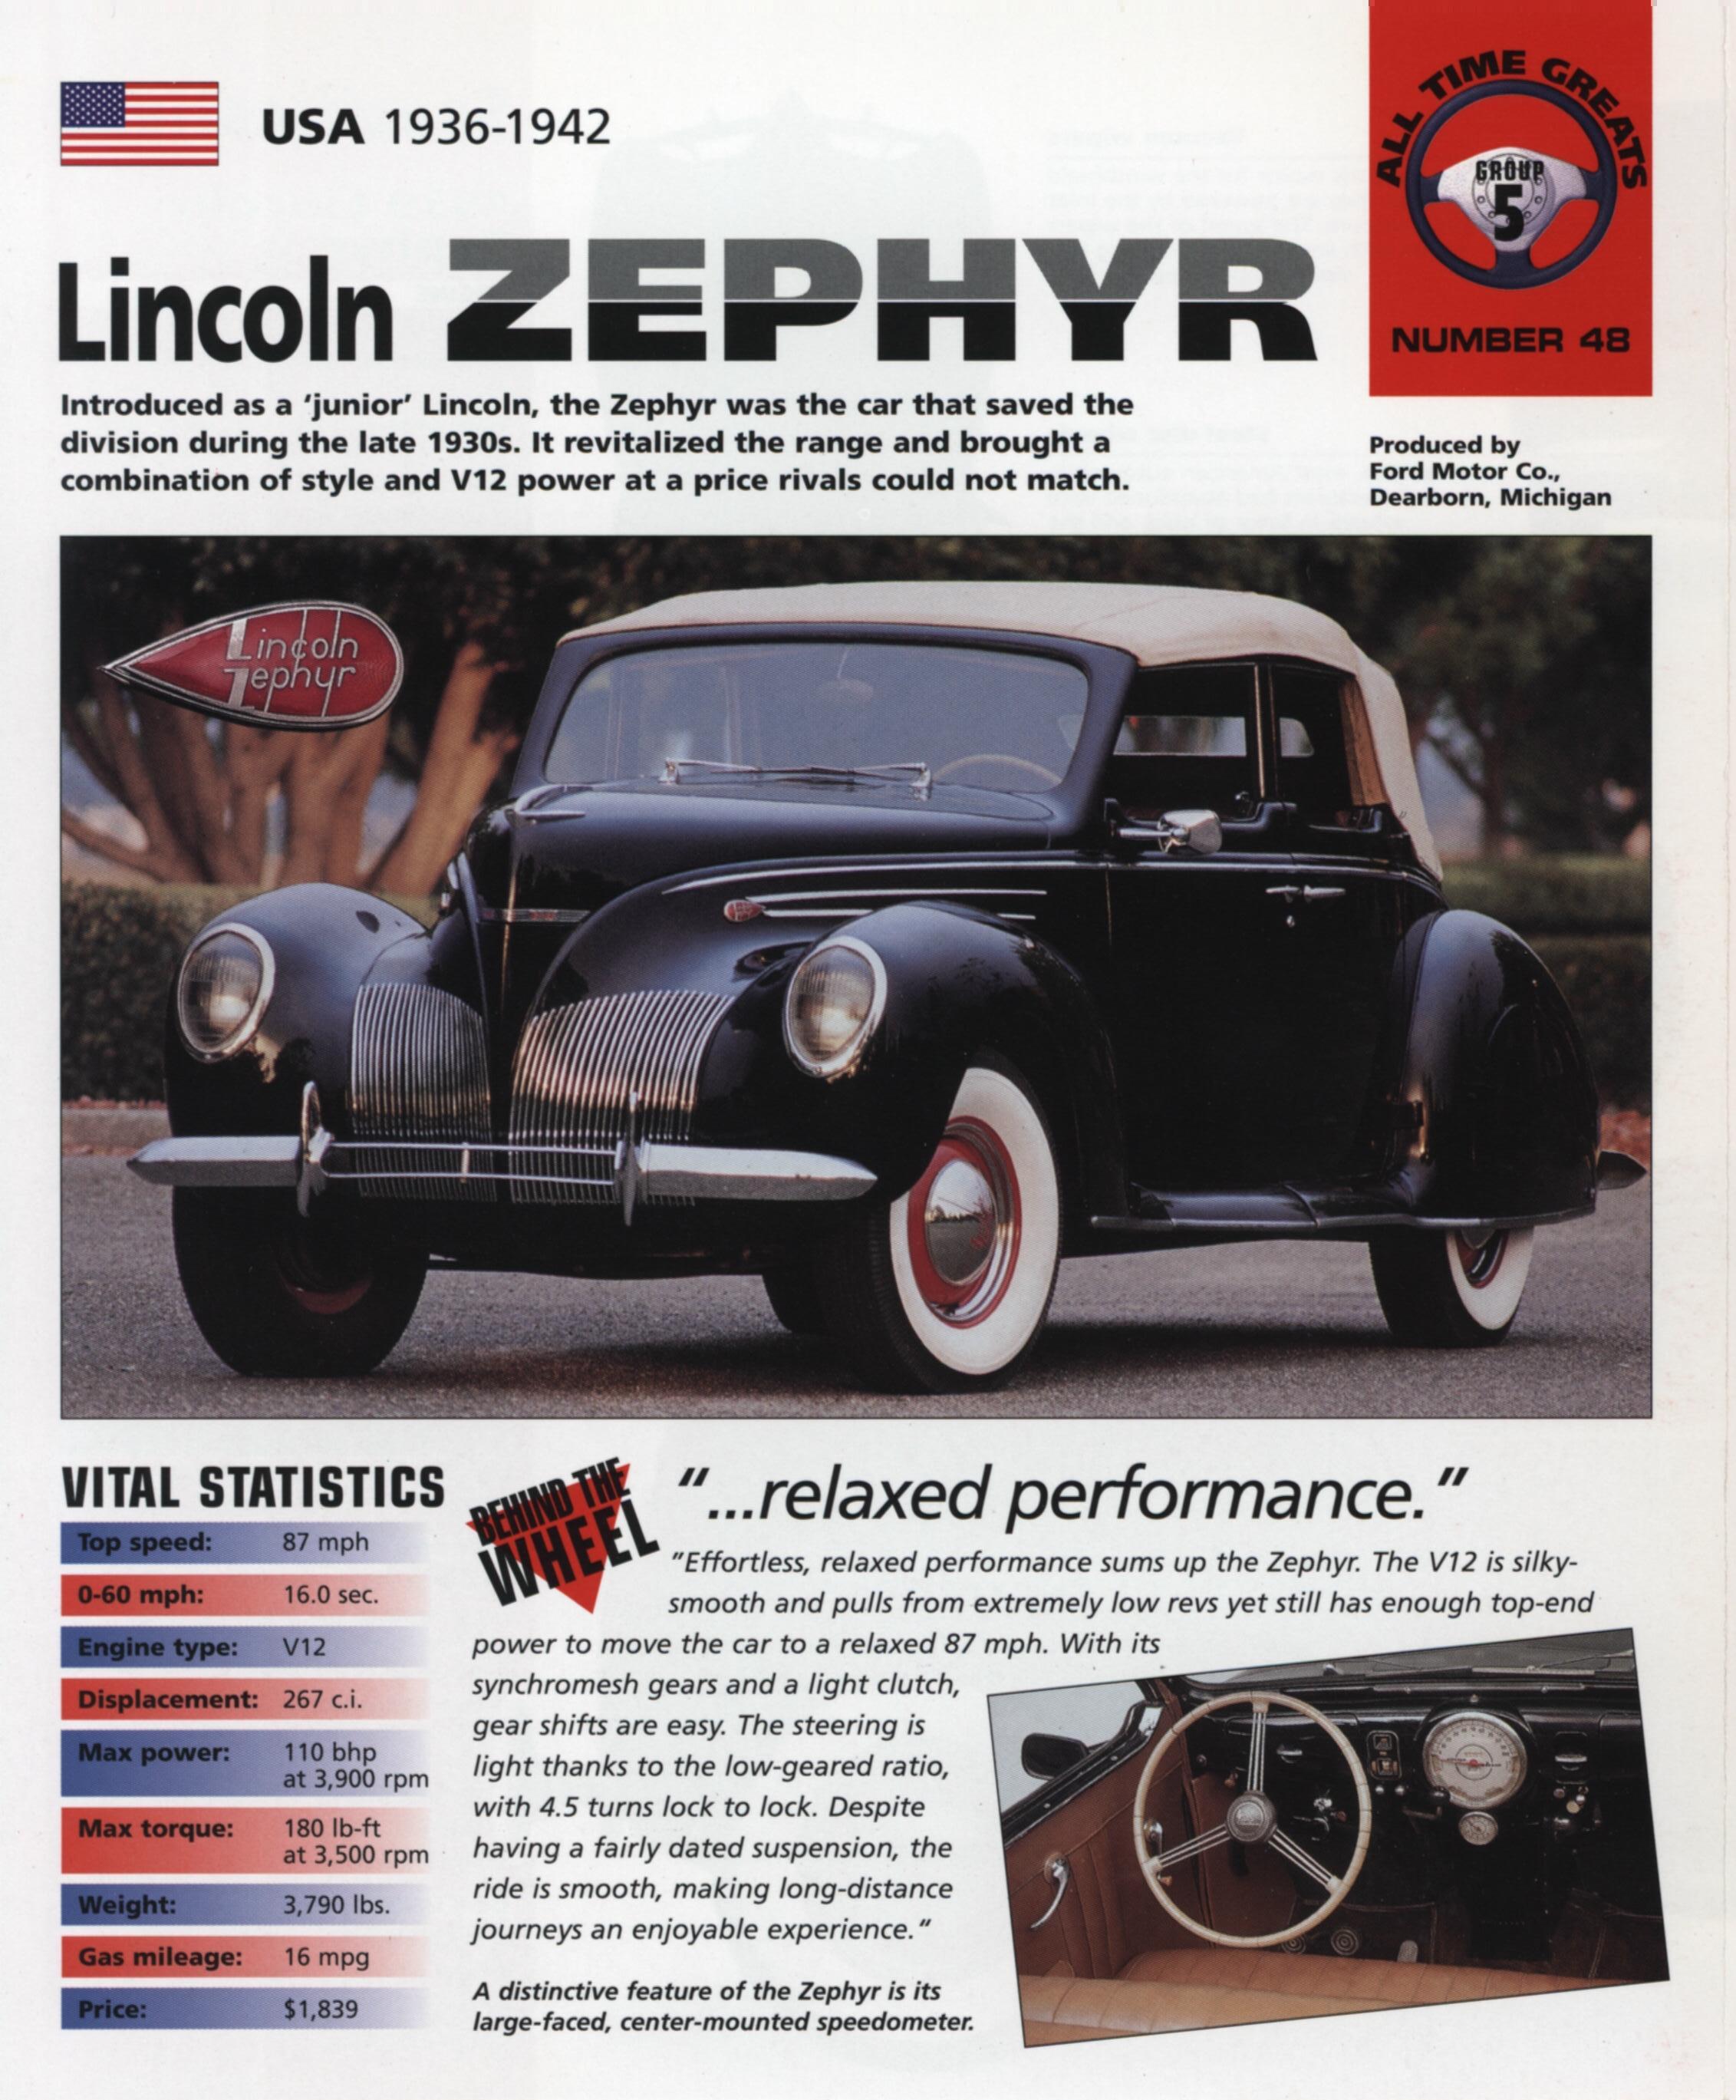 1936-42 Lincoln Zephyr - IMP Brochure